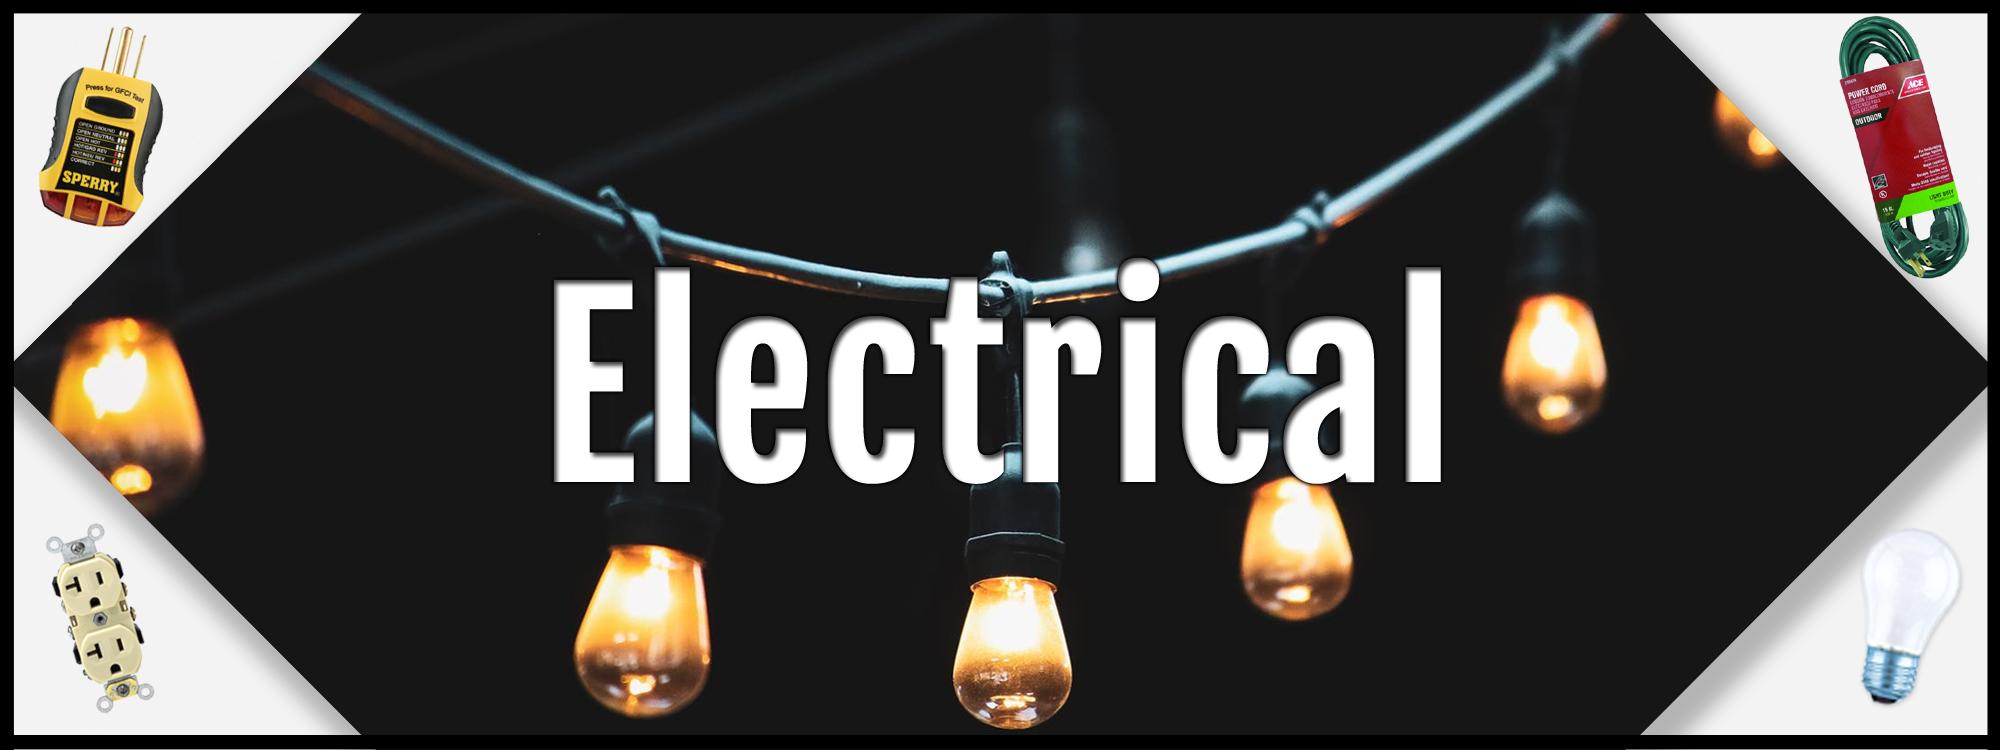 new electrical banner copy.jpg